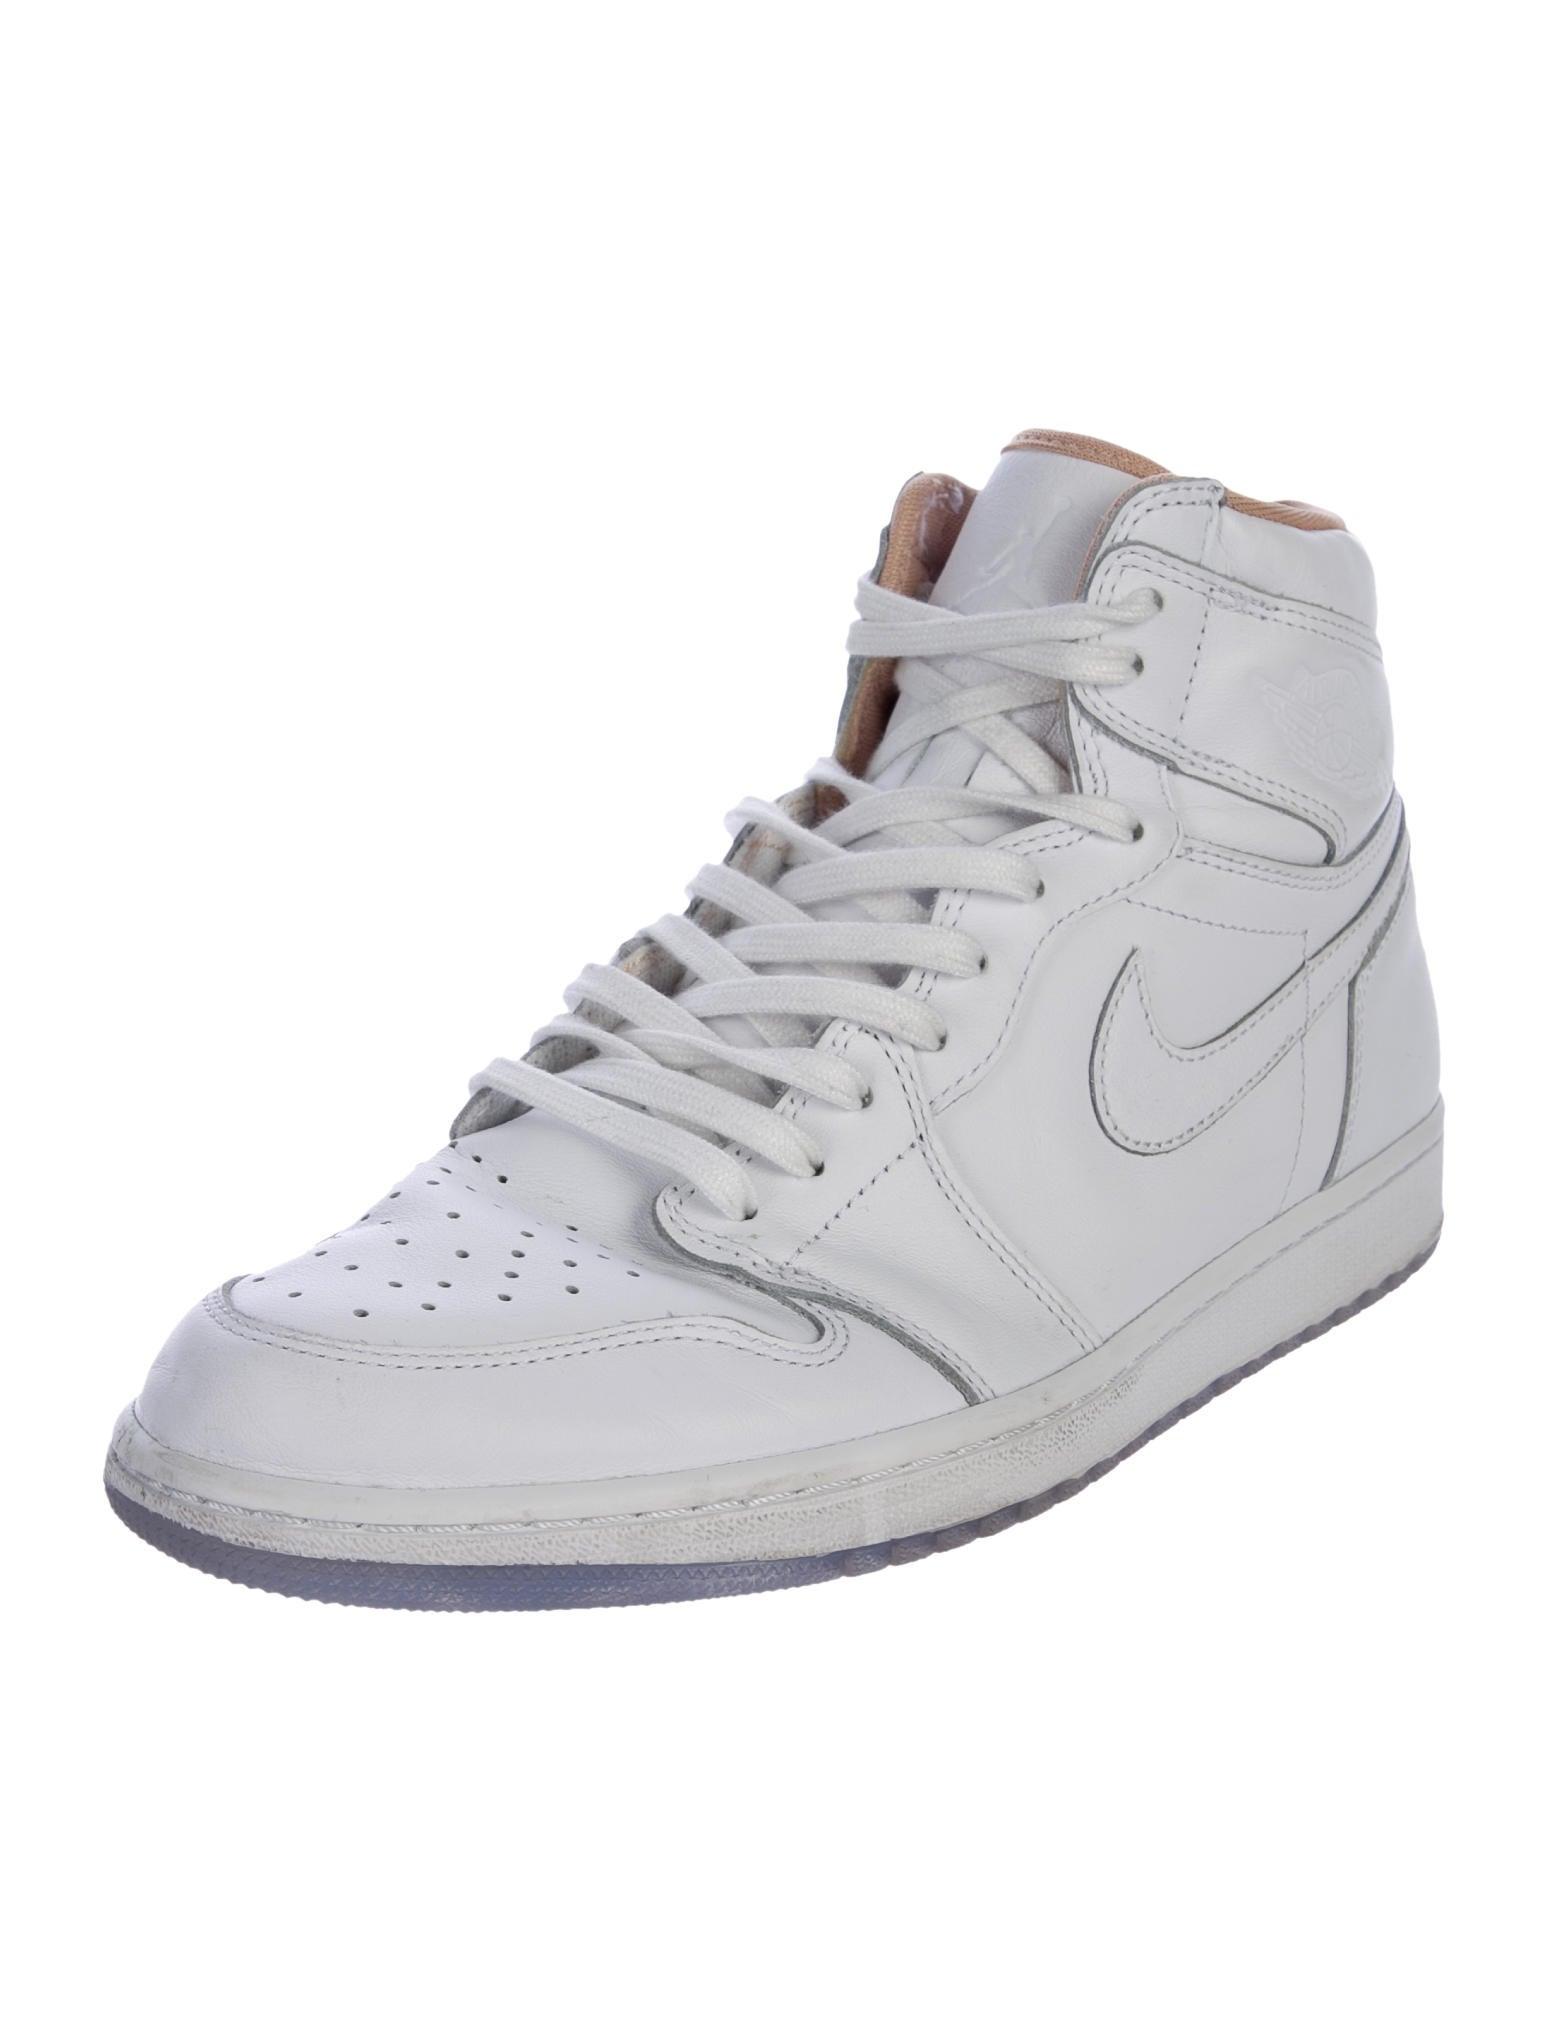 Air Jordan Heels Shoes